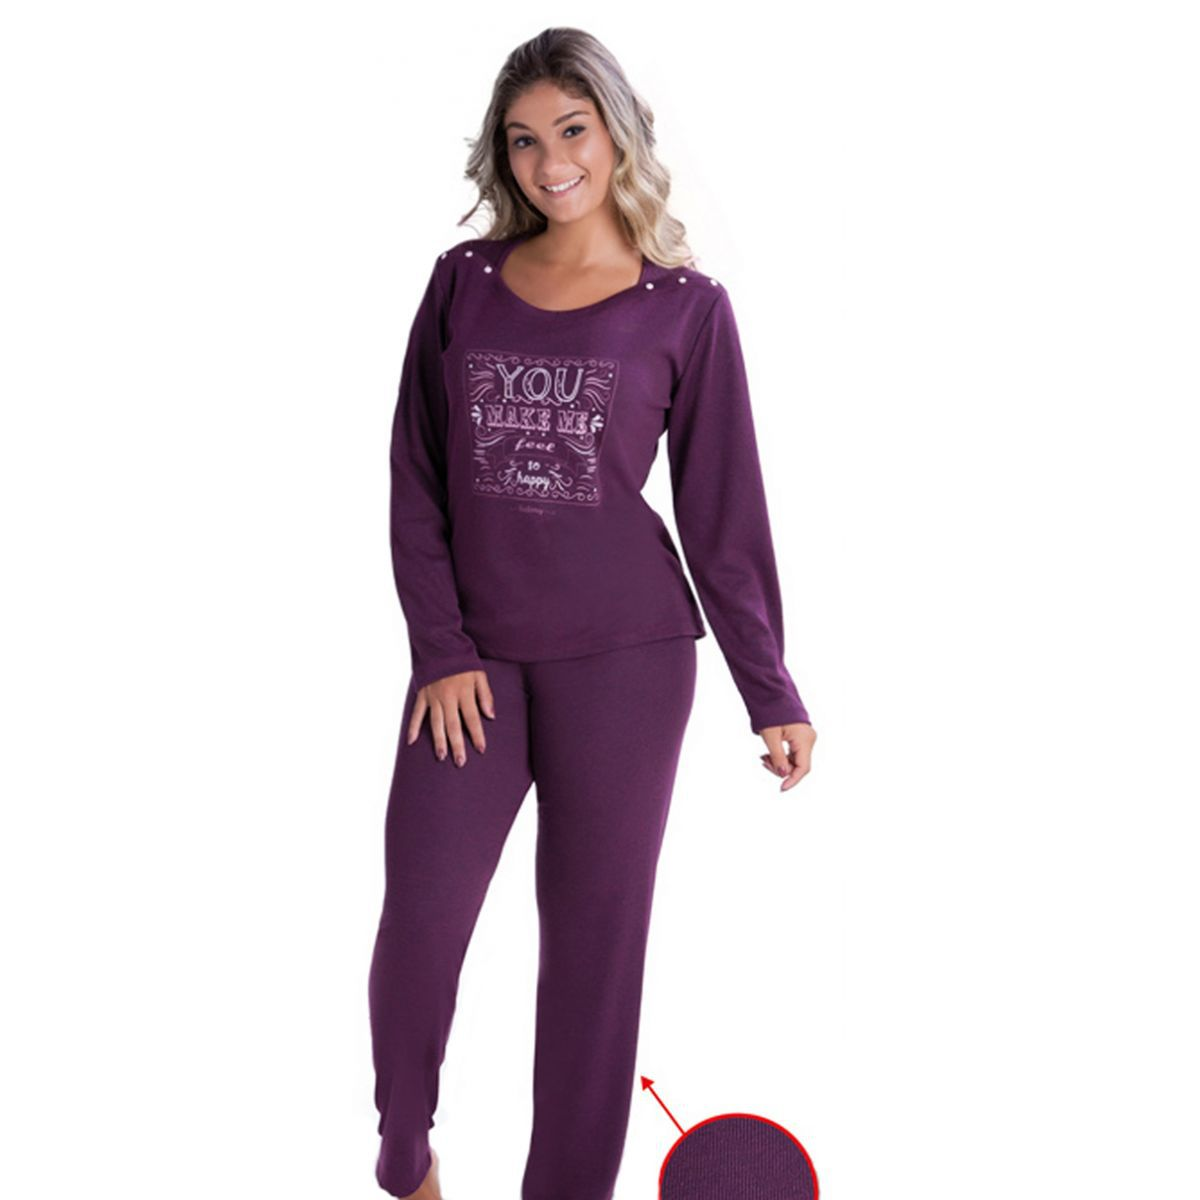 Pijama Inverno Canelado-Victory 17104